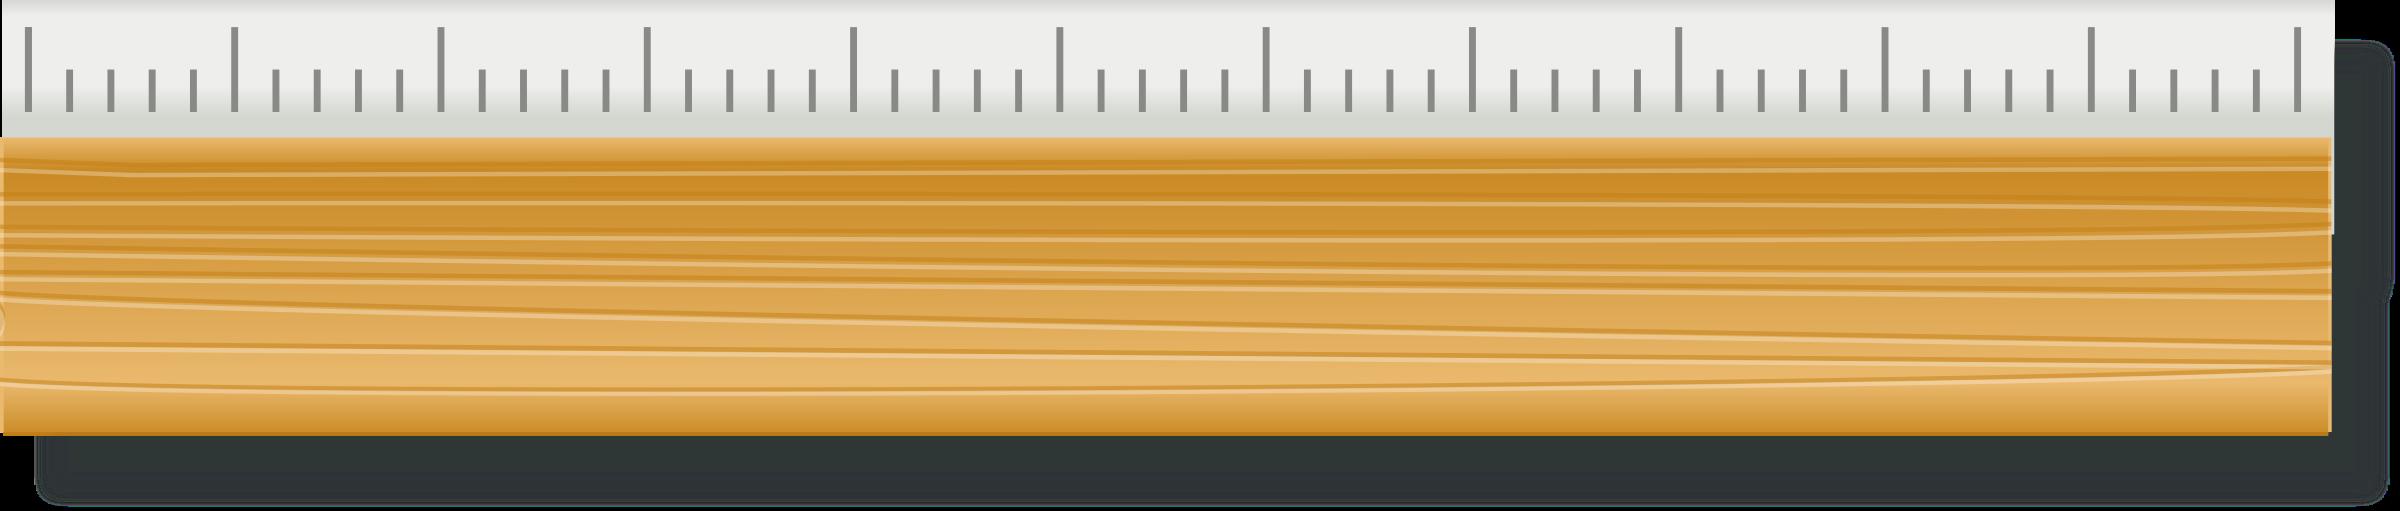 clipart ruler blank